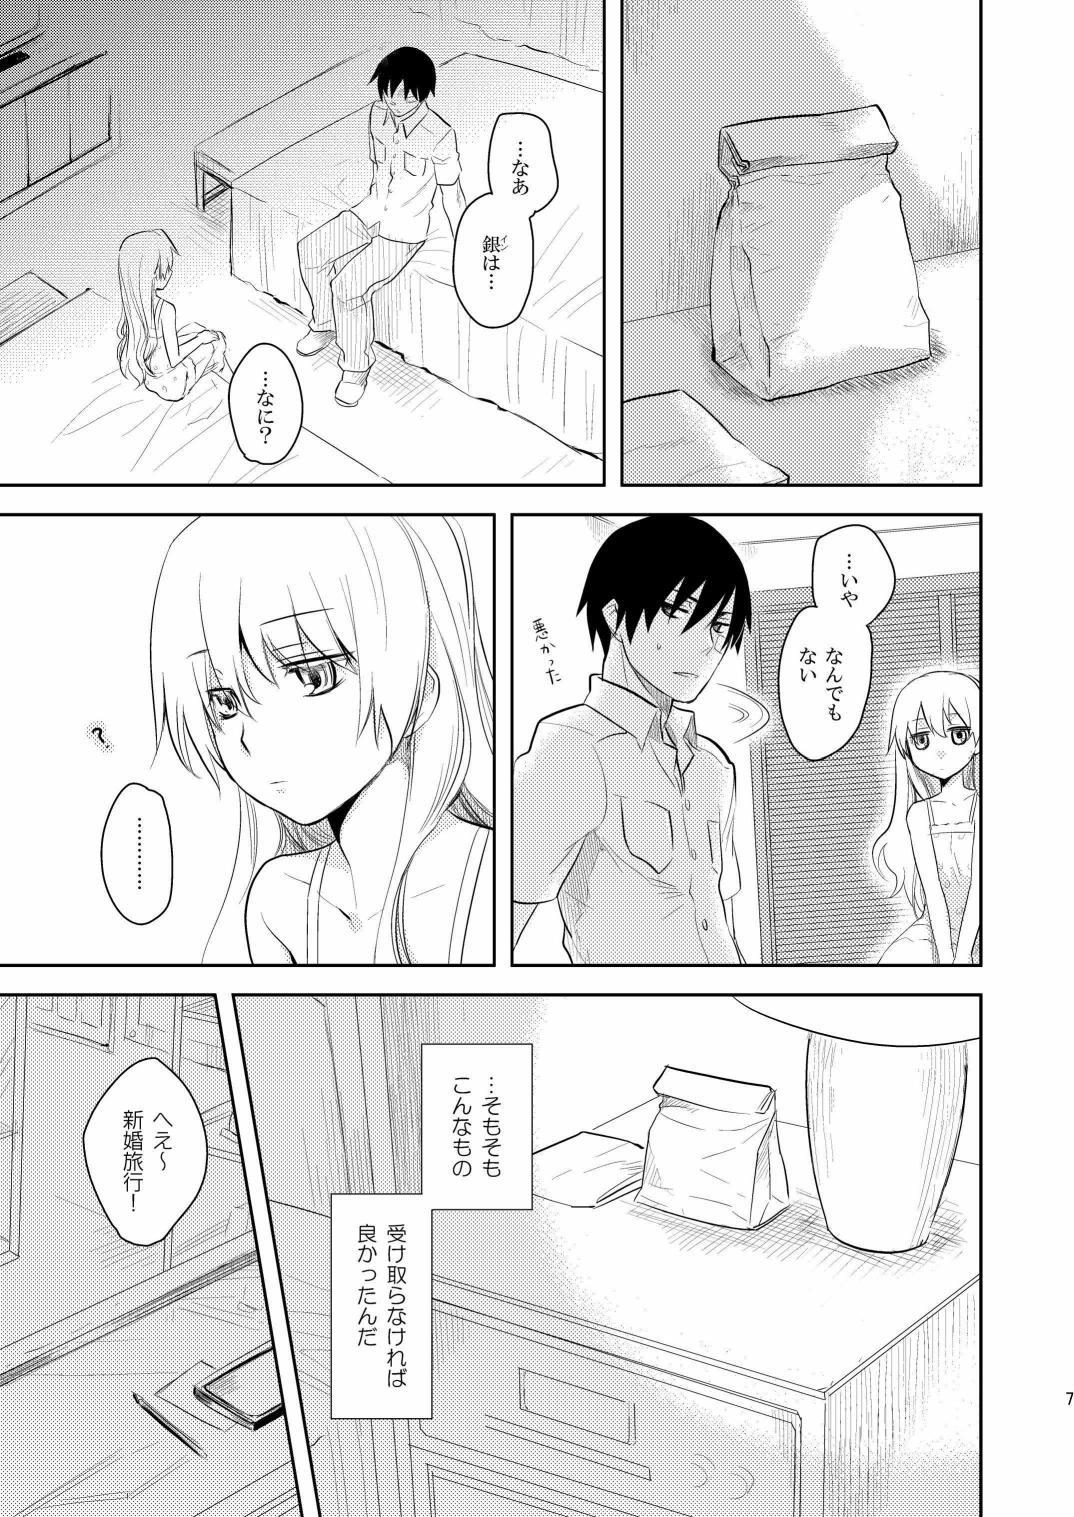 (COMIC1☆4) [AHM (Inu-Blade, Lact Mangan)] Kuroda (Tsuma) Shichihenge (DARKER THAN BLACK) 5